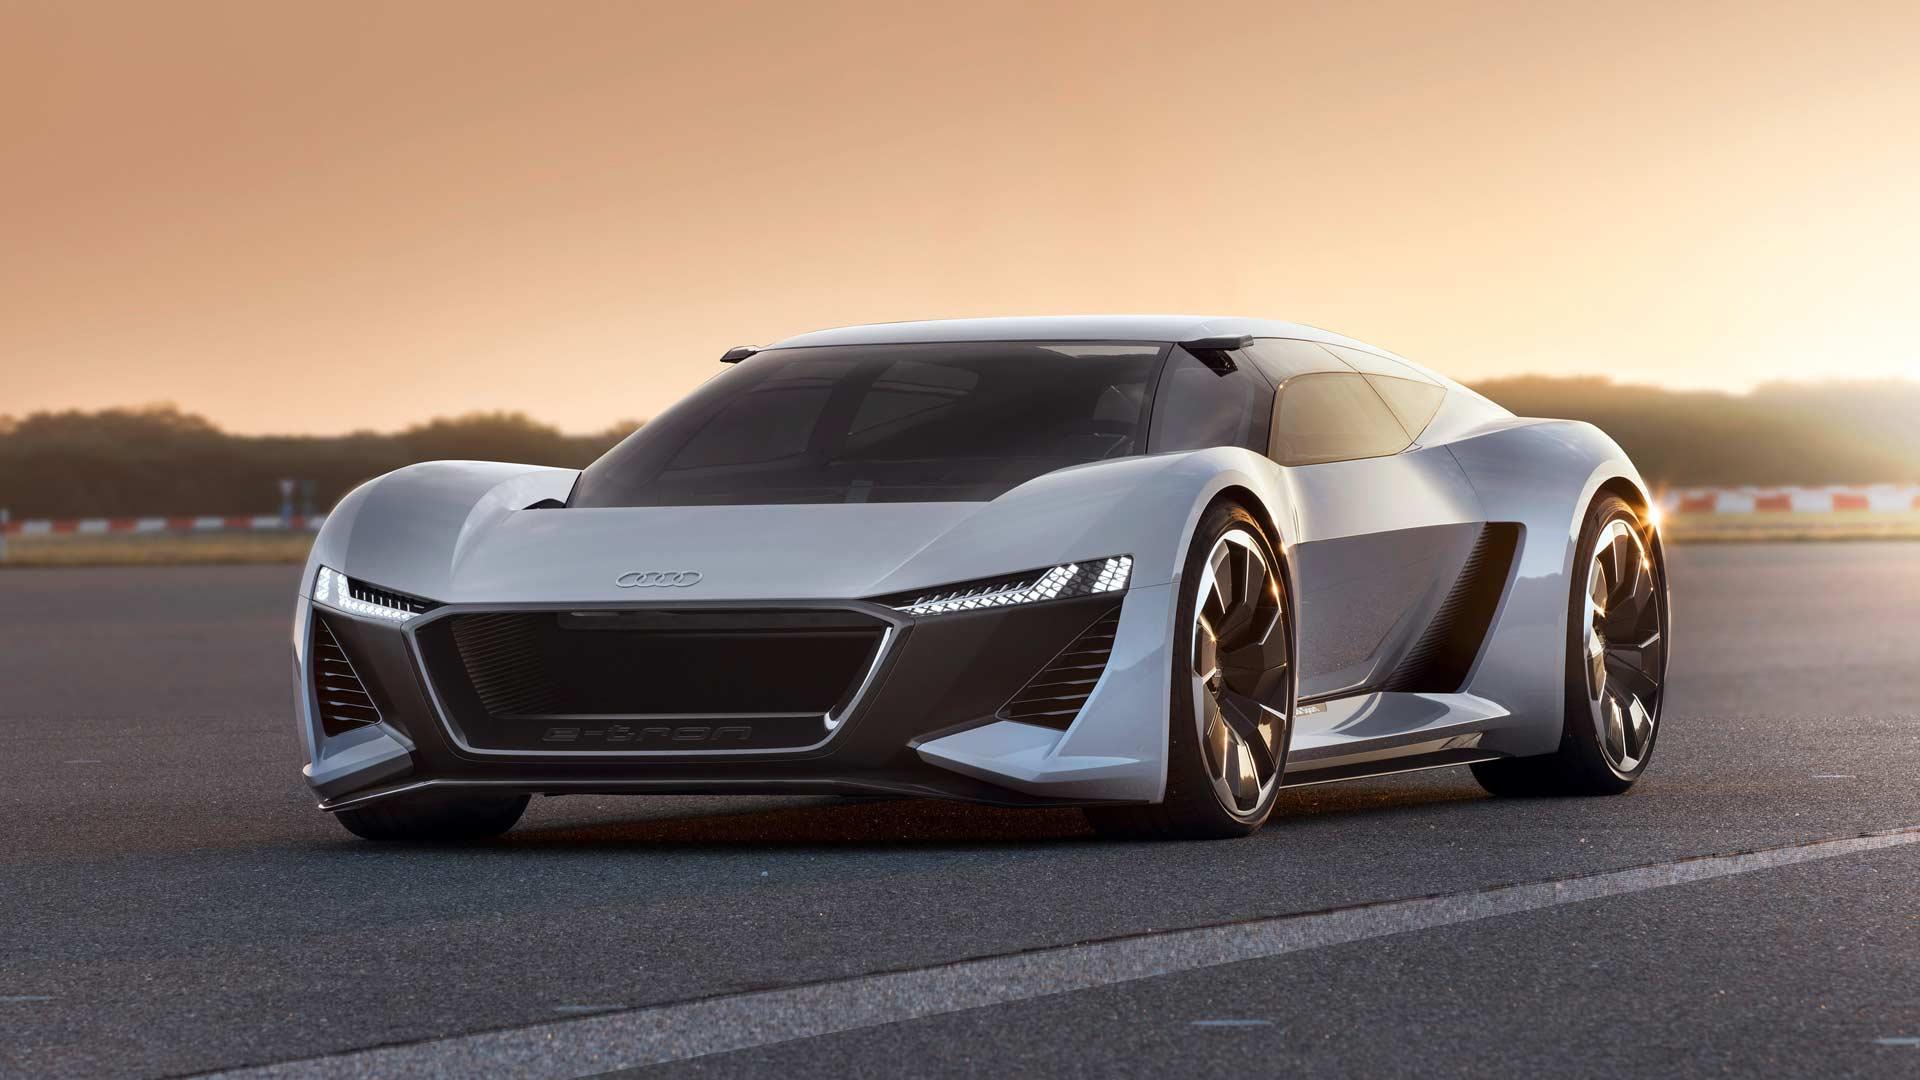 Audi-PB18-e-tron-concept